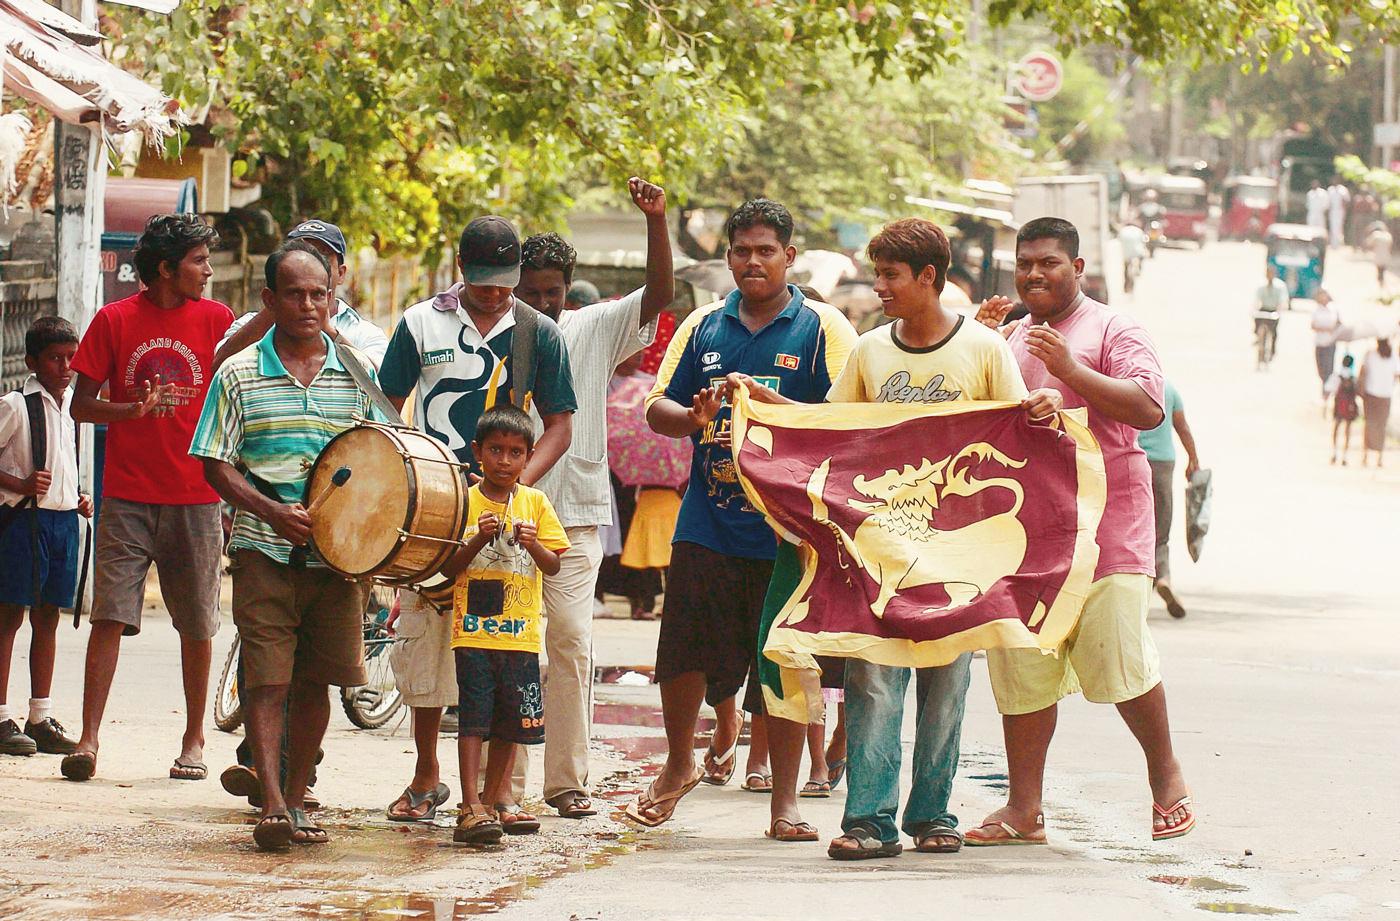 Fans celebrate Sri Lanka's 2007 semi-final win the best way they know